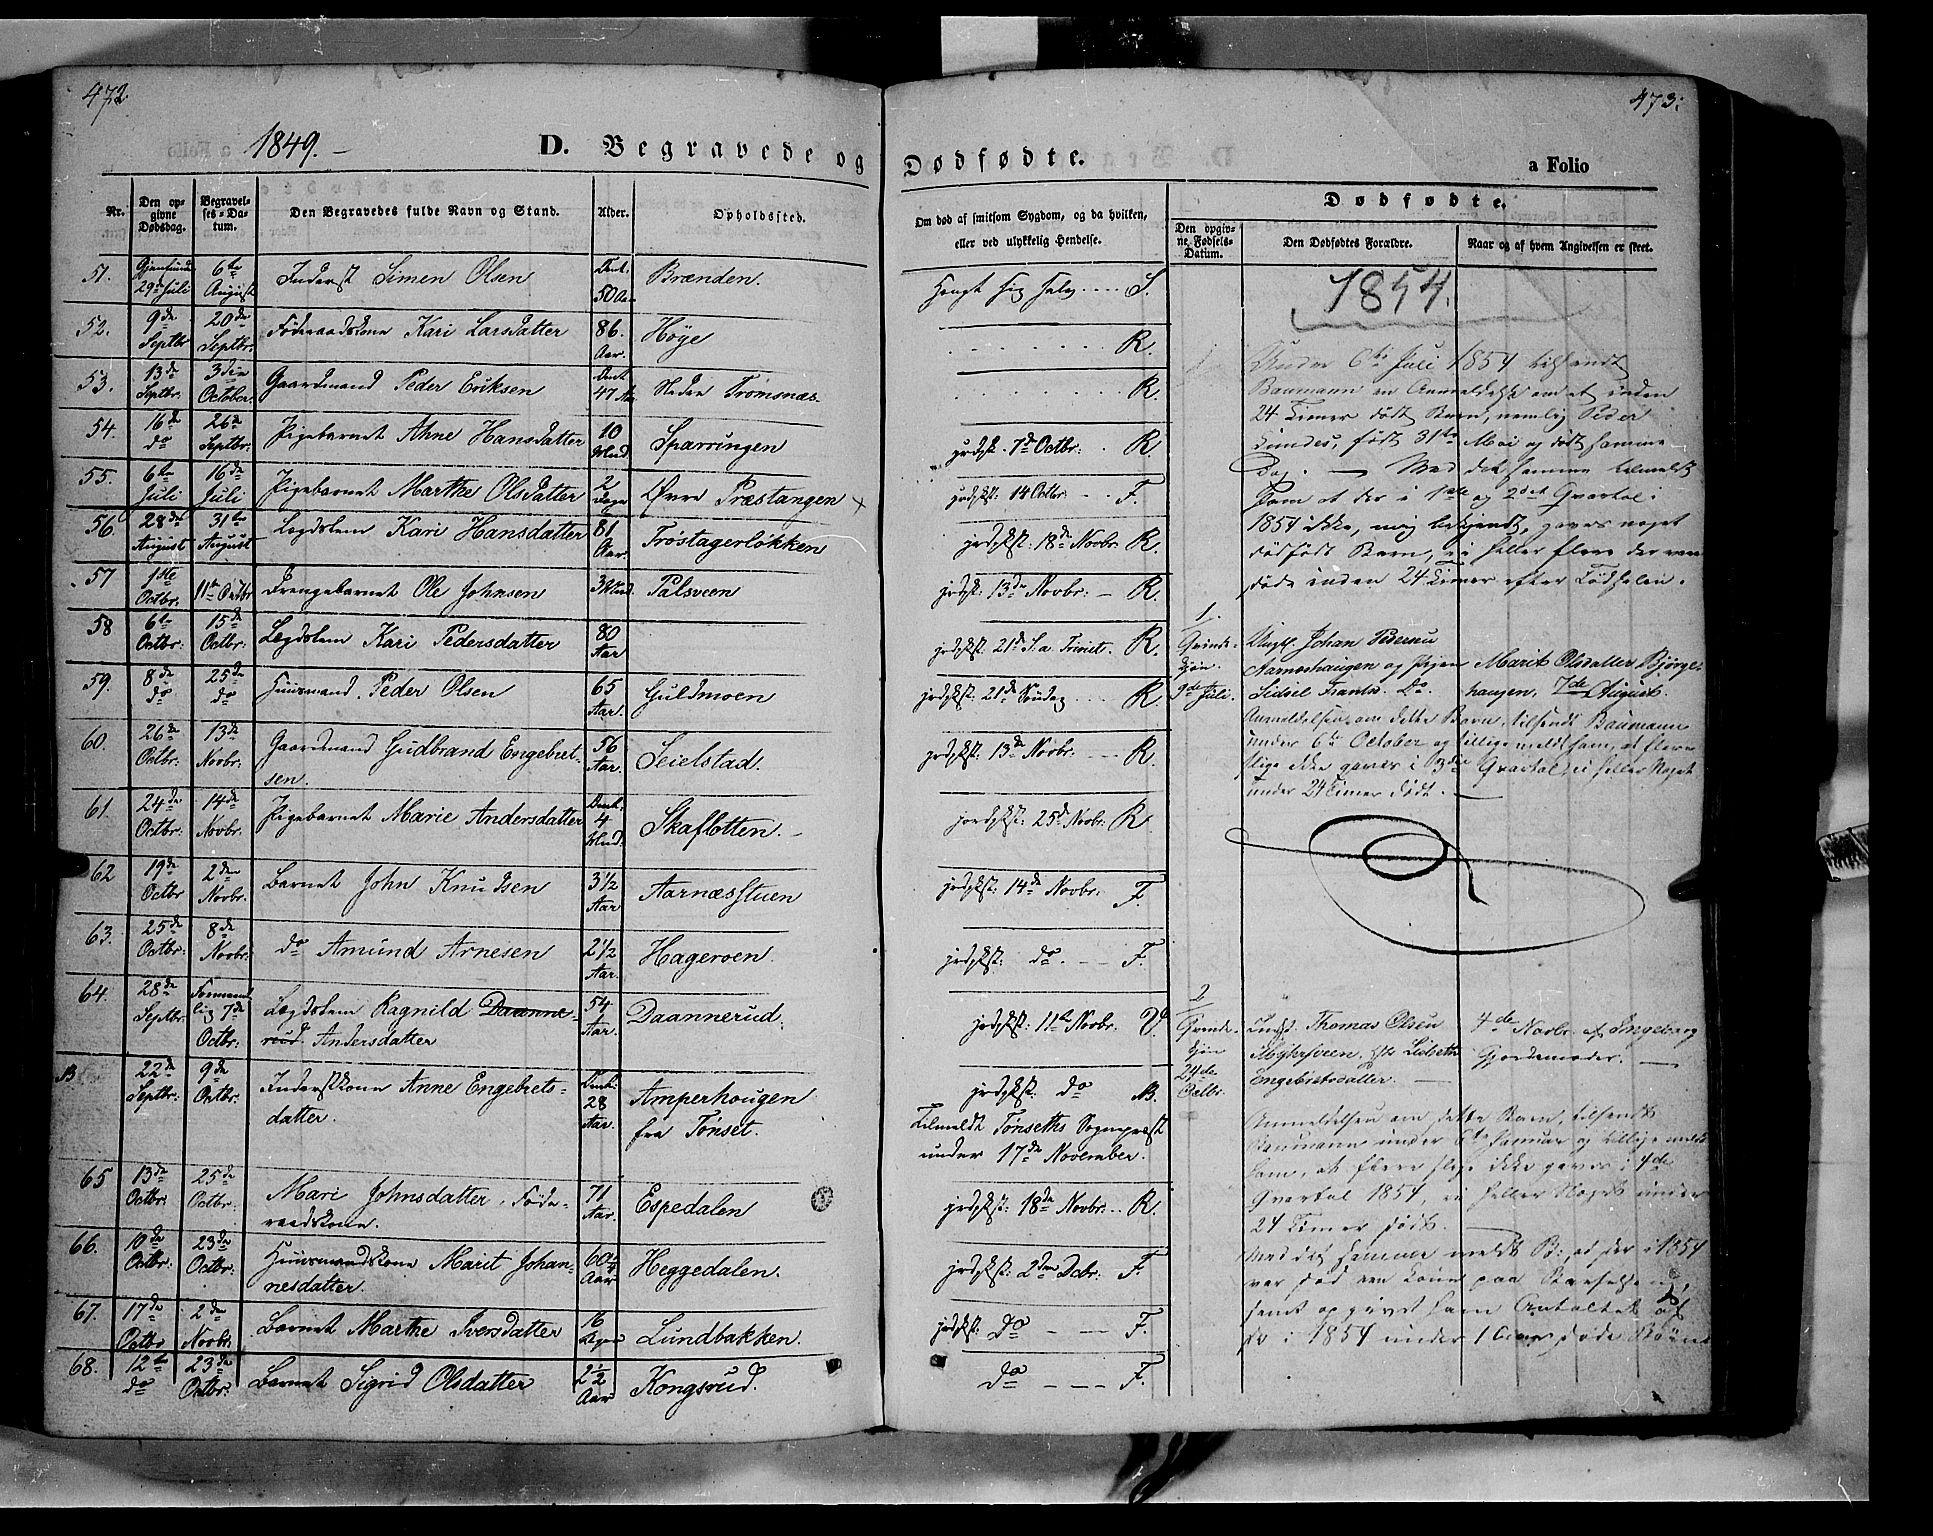 SAH, Ringebu prestekontor, Ministerialbok nr. 6, 1848-1859, s. 472-473